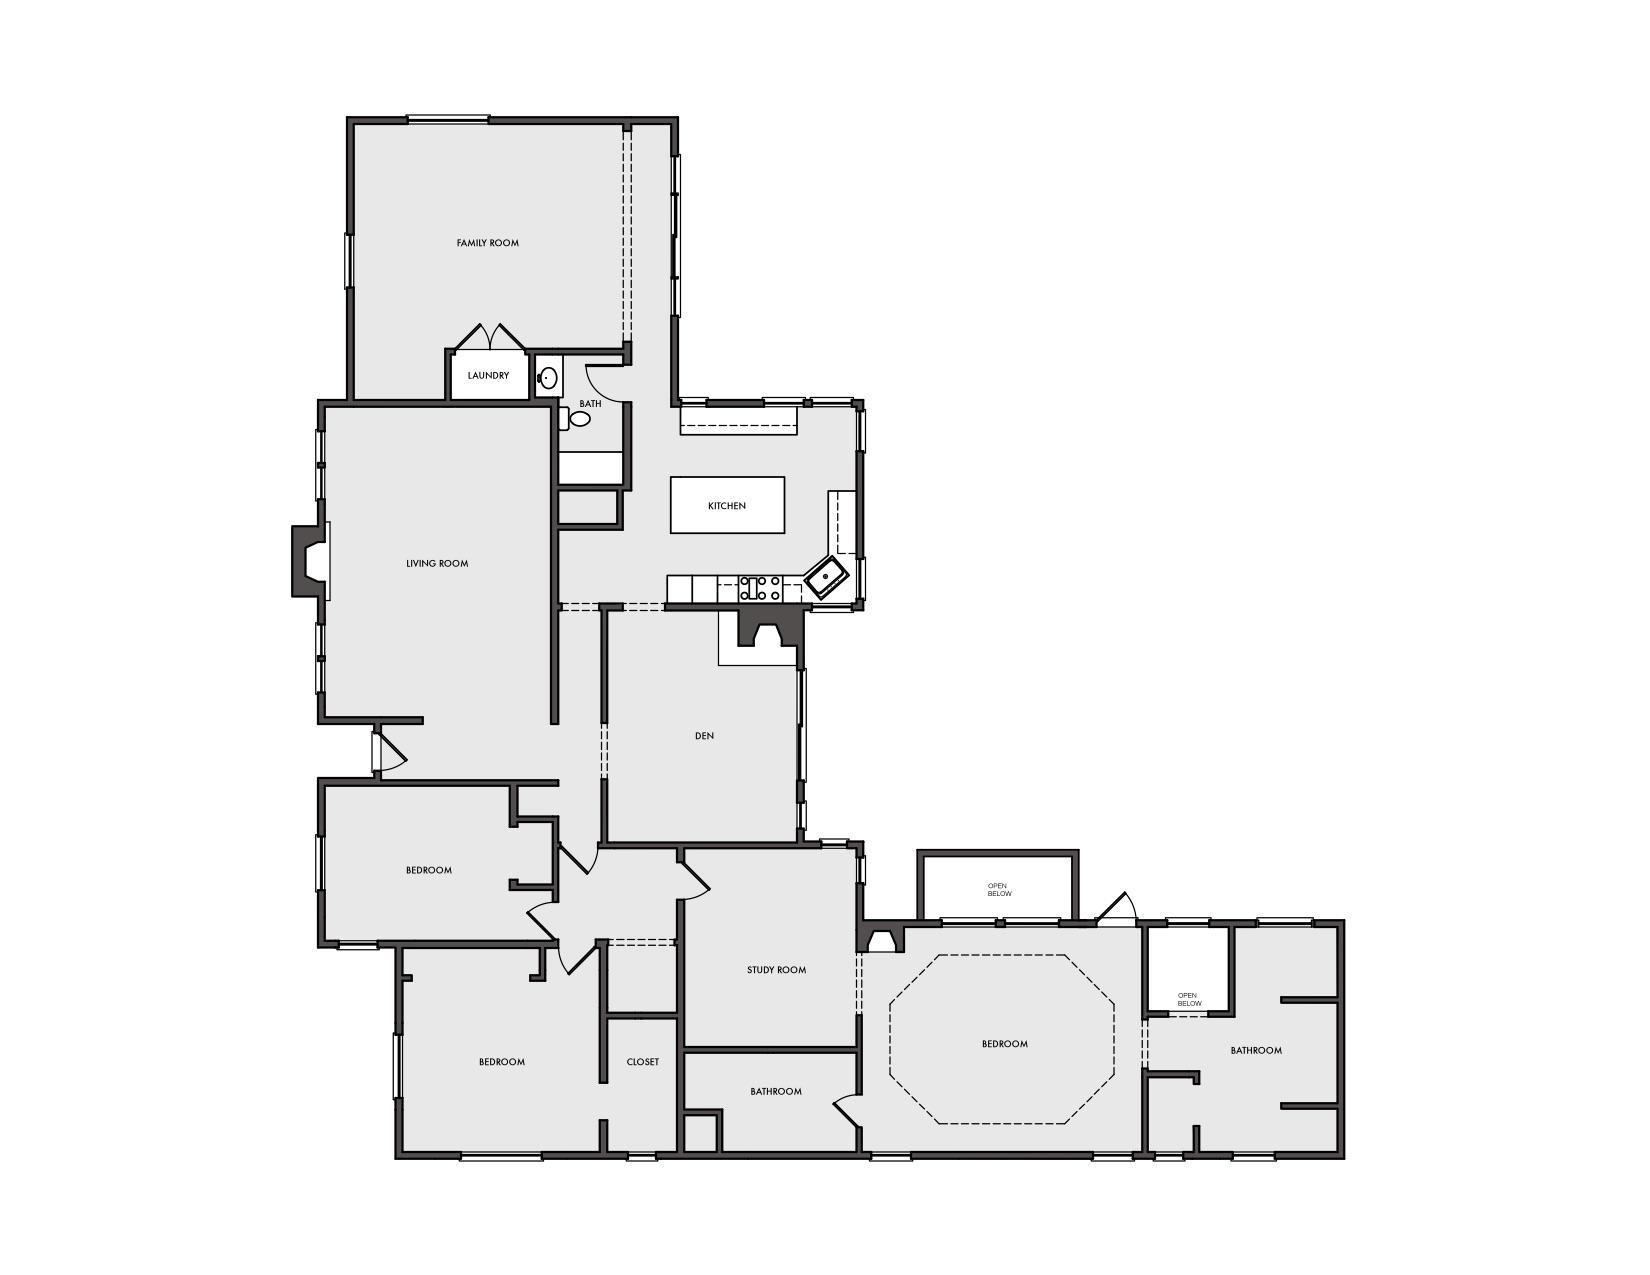 Exsiting Floor Plan